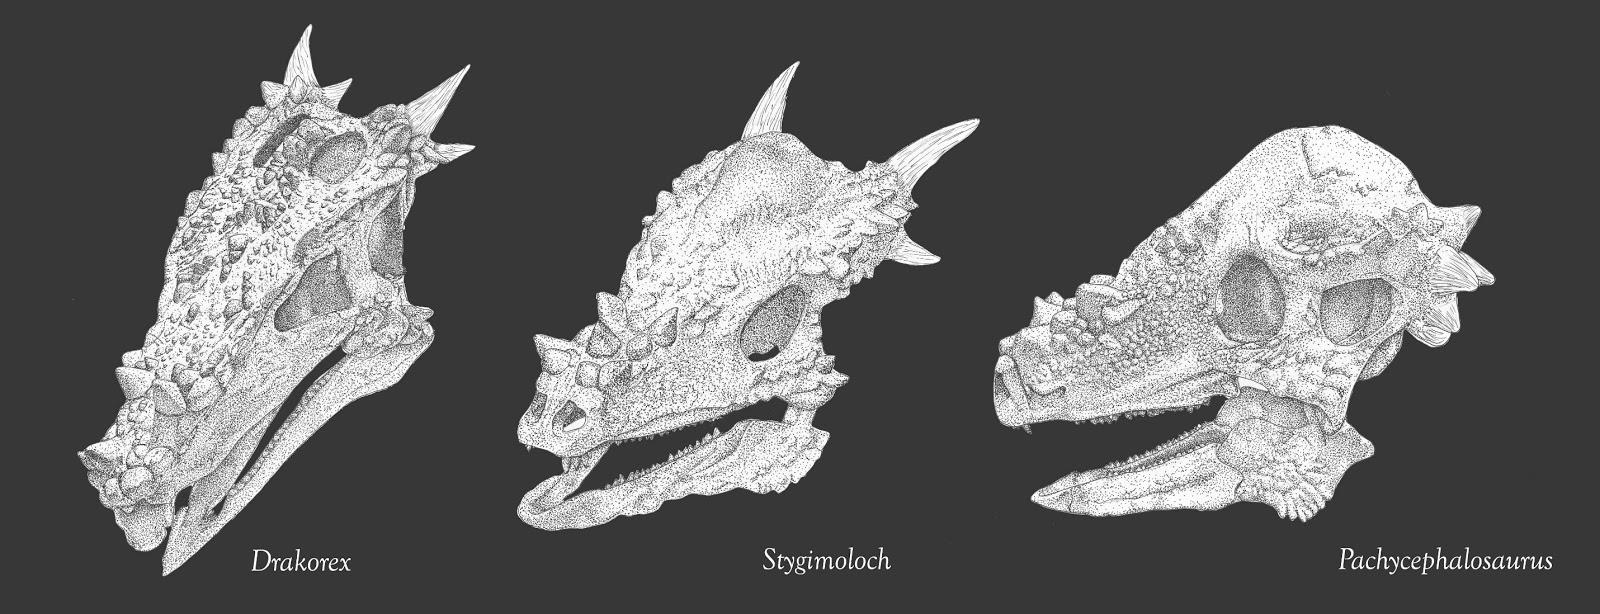 Evolutionary Vertebrate Zoology March 2013